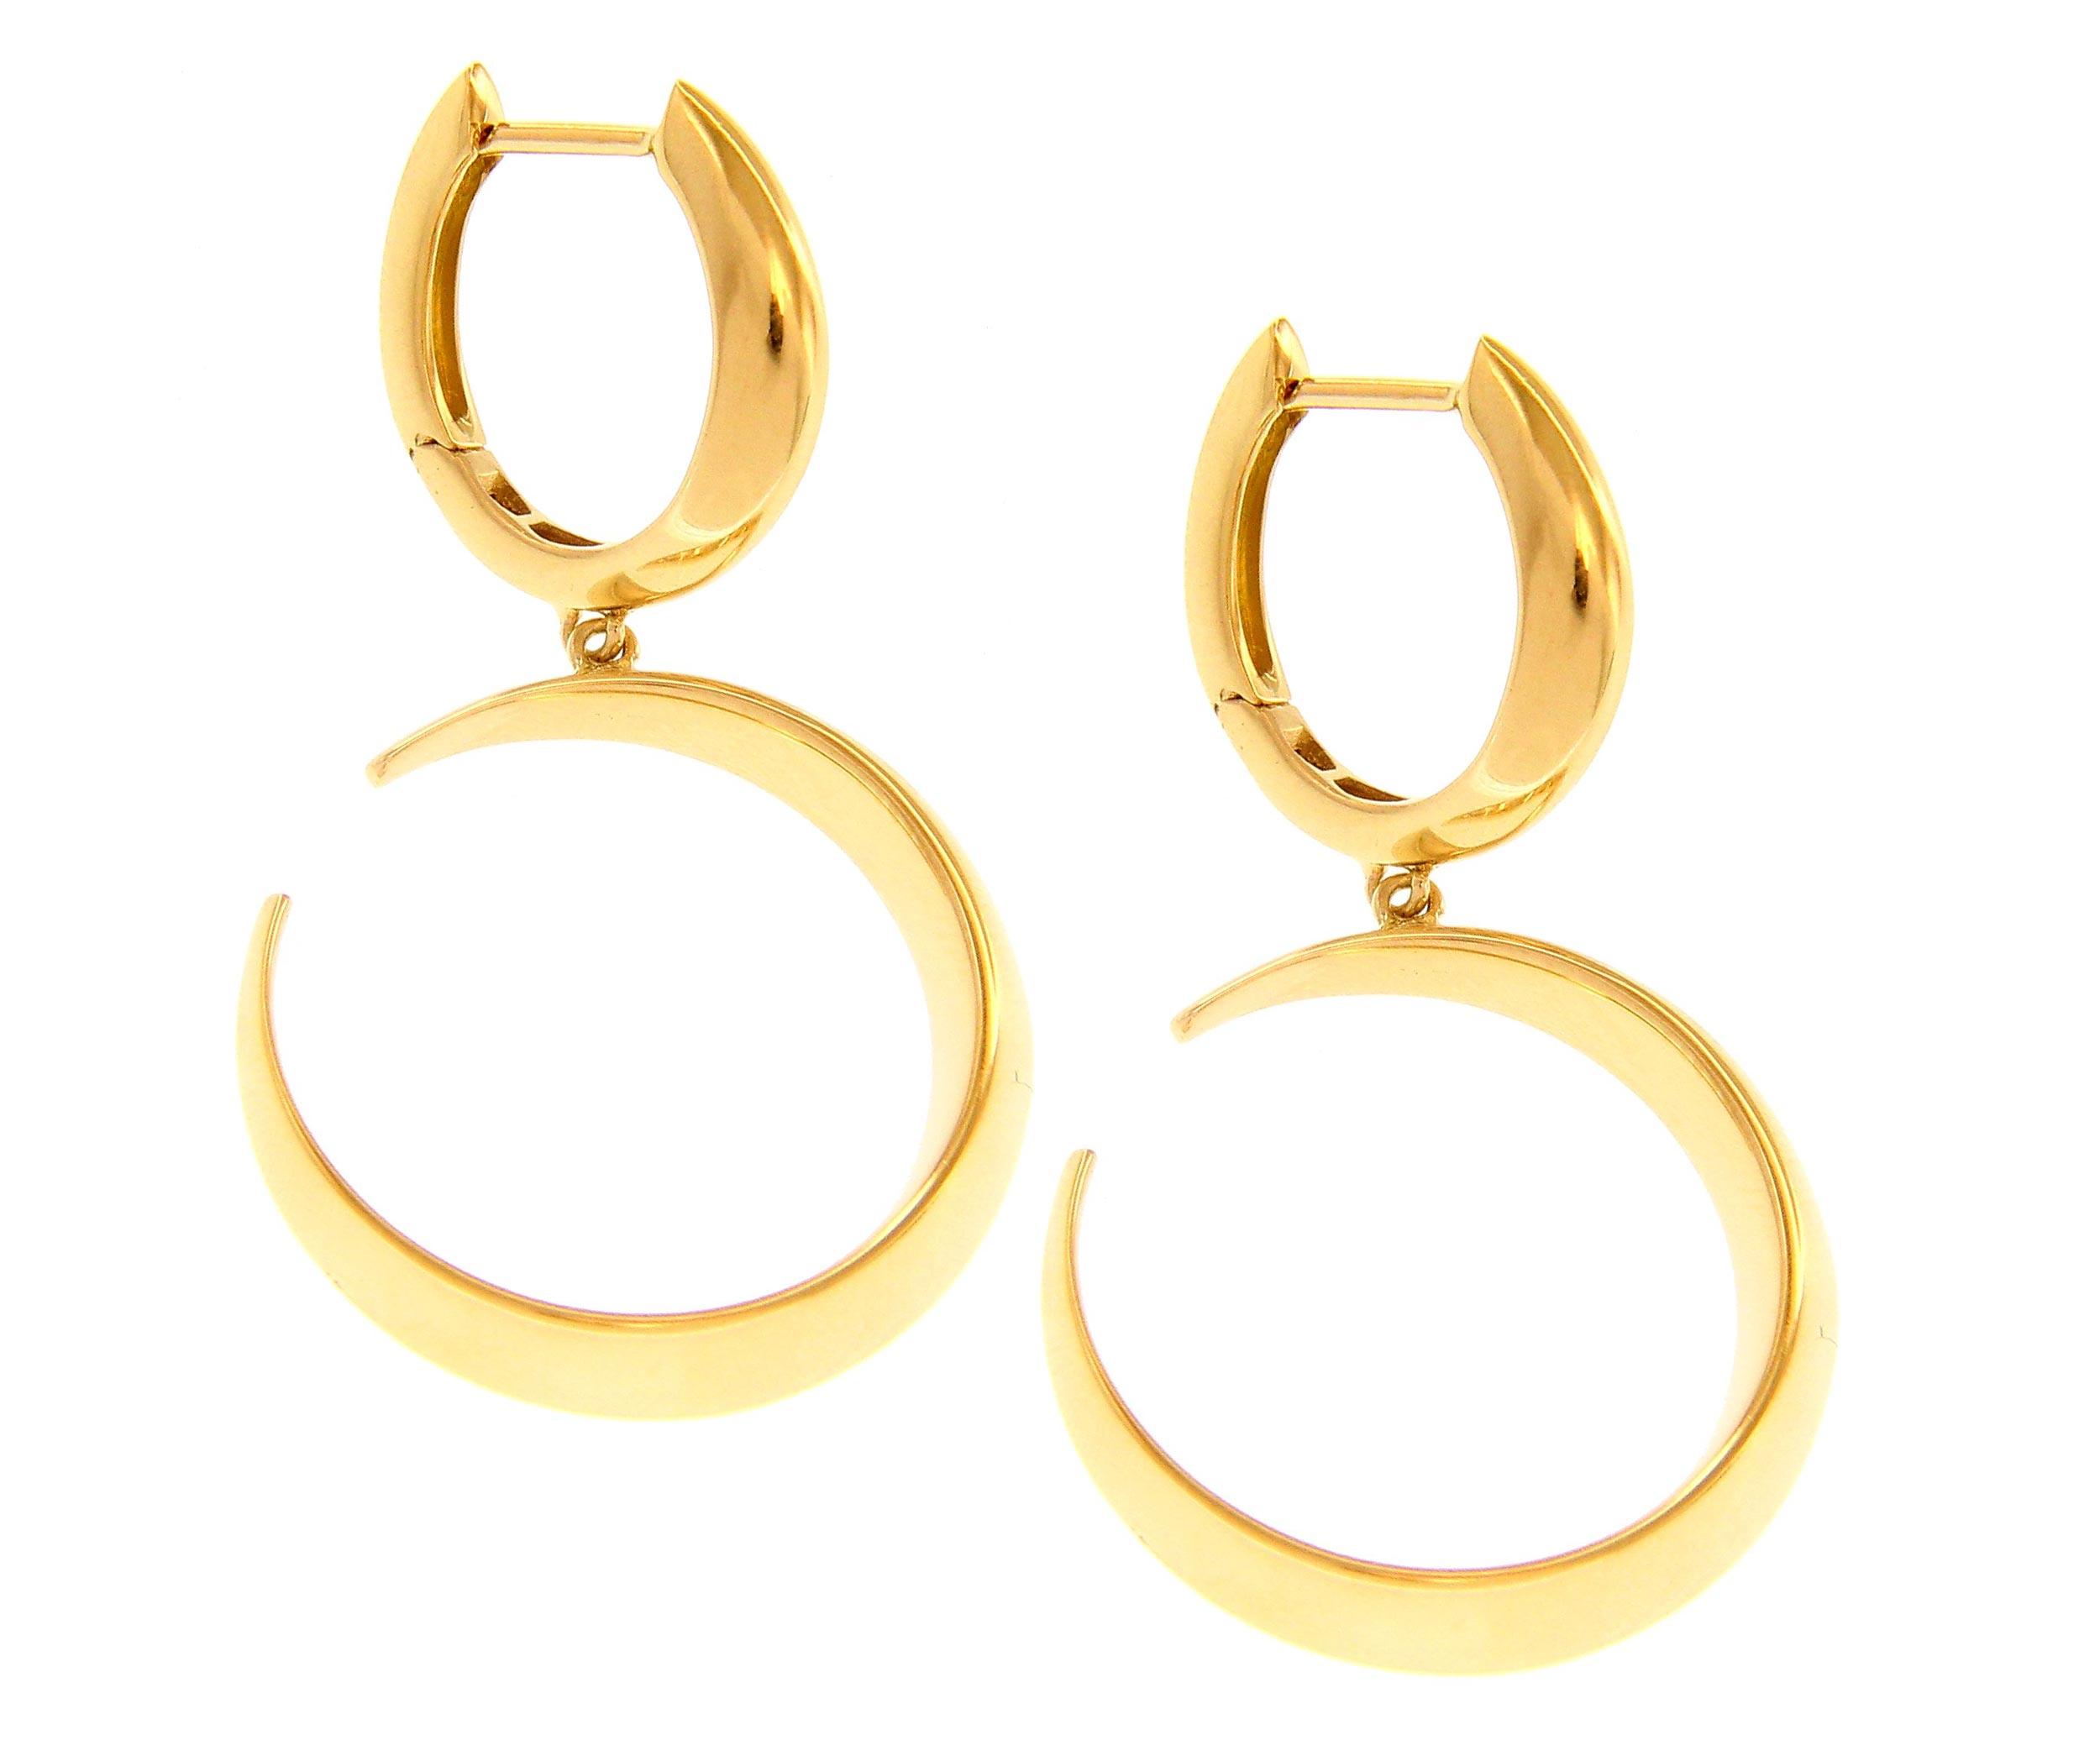 Beautiful 18ct Yellow Hinged Snap Earrings